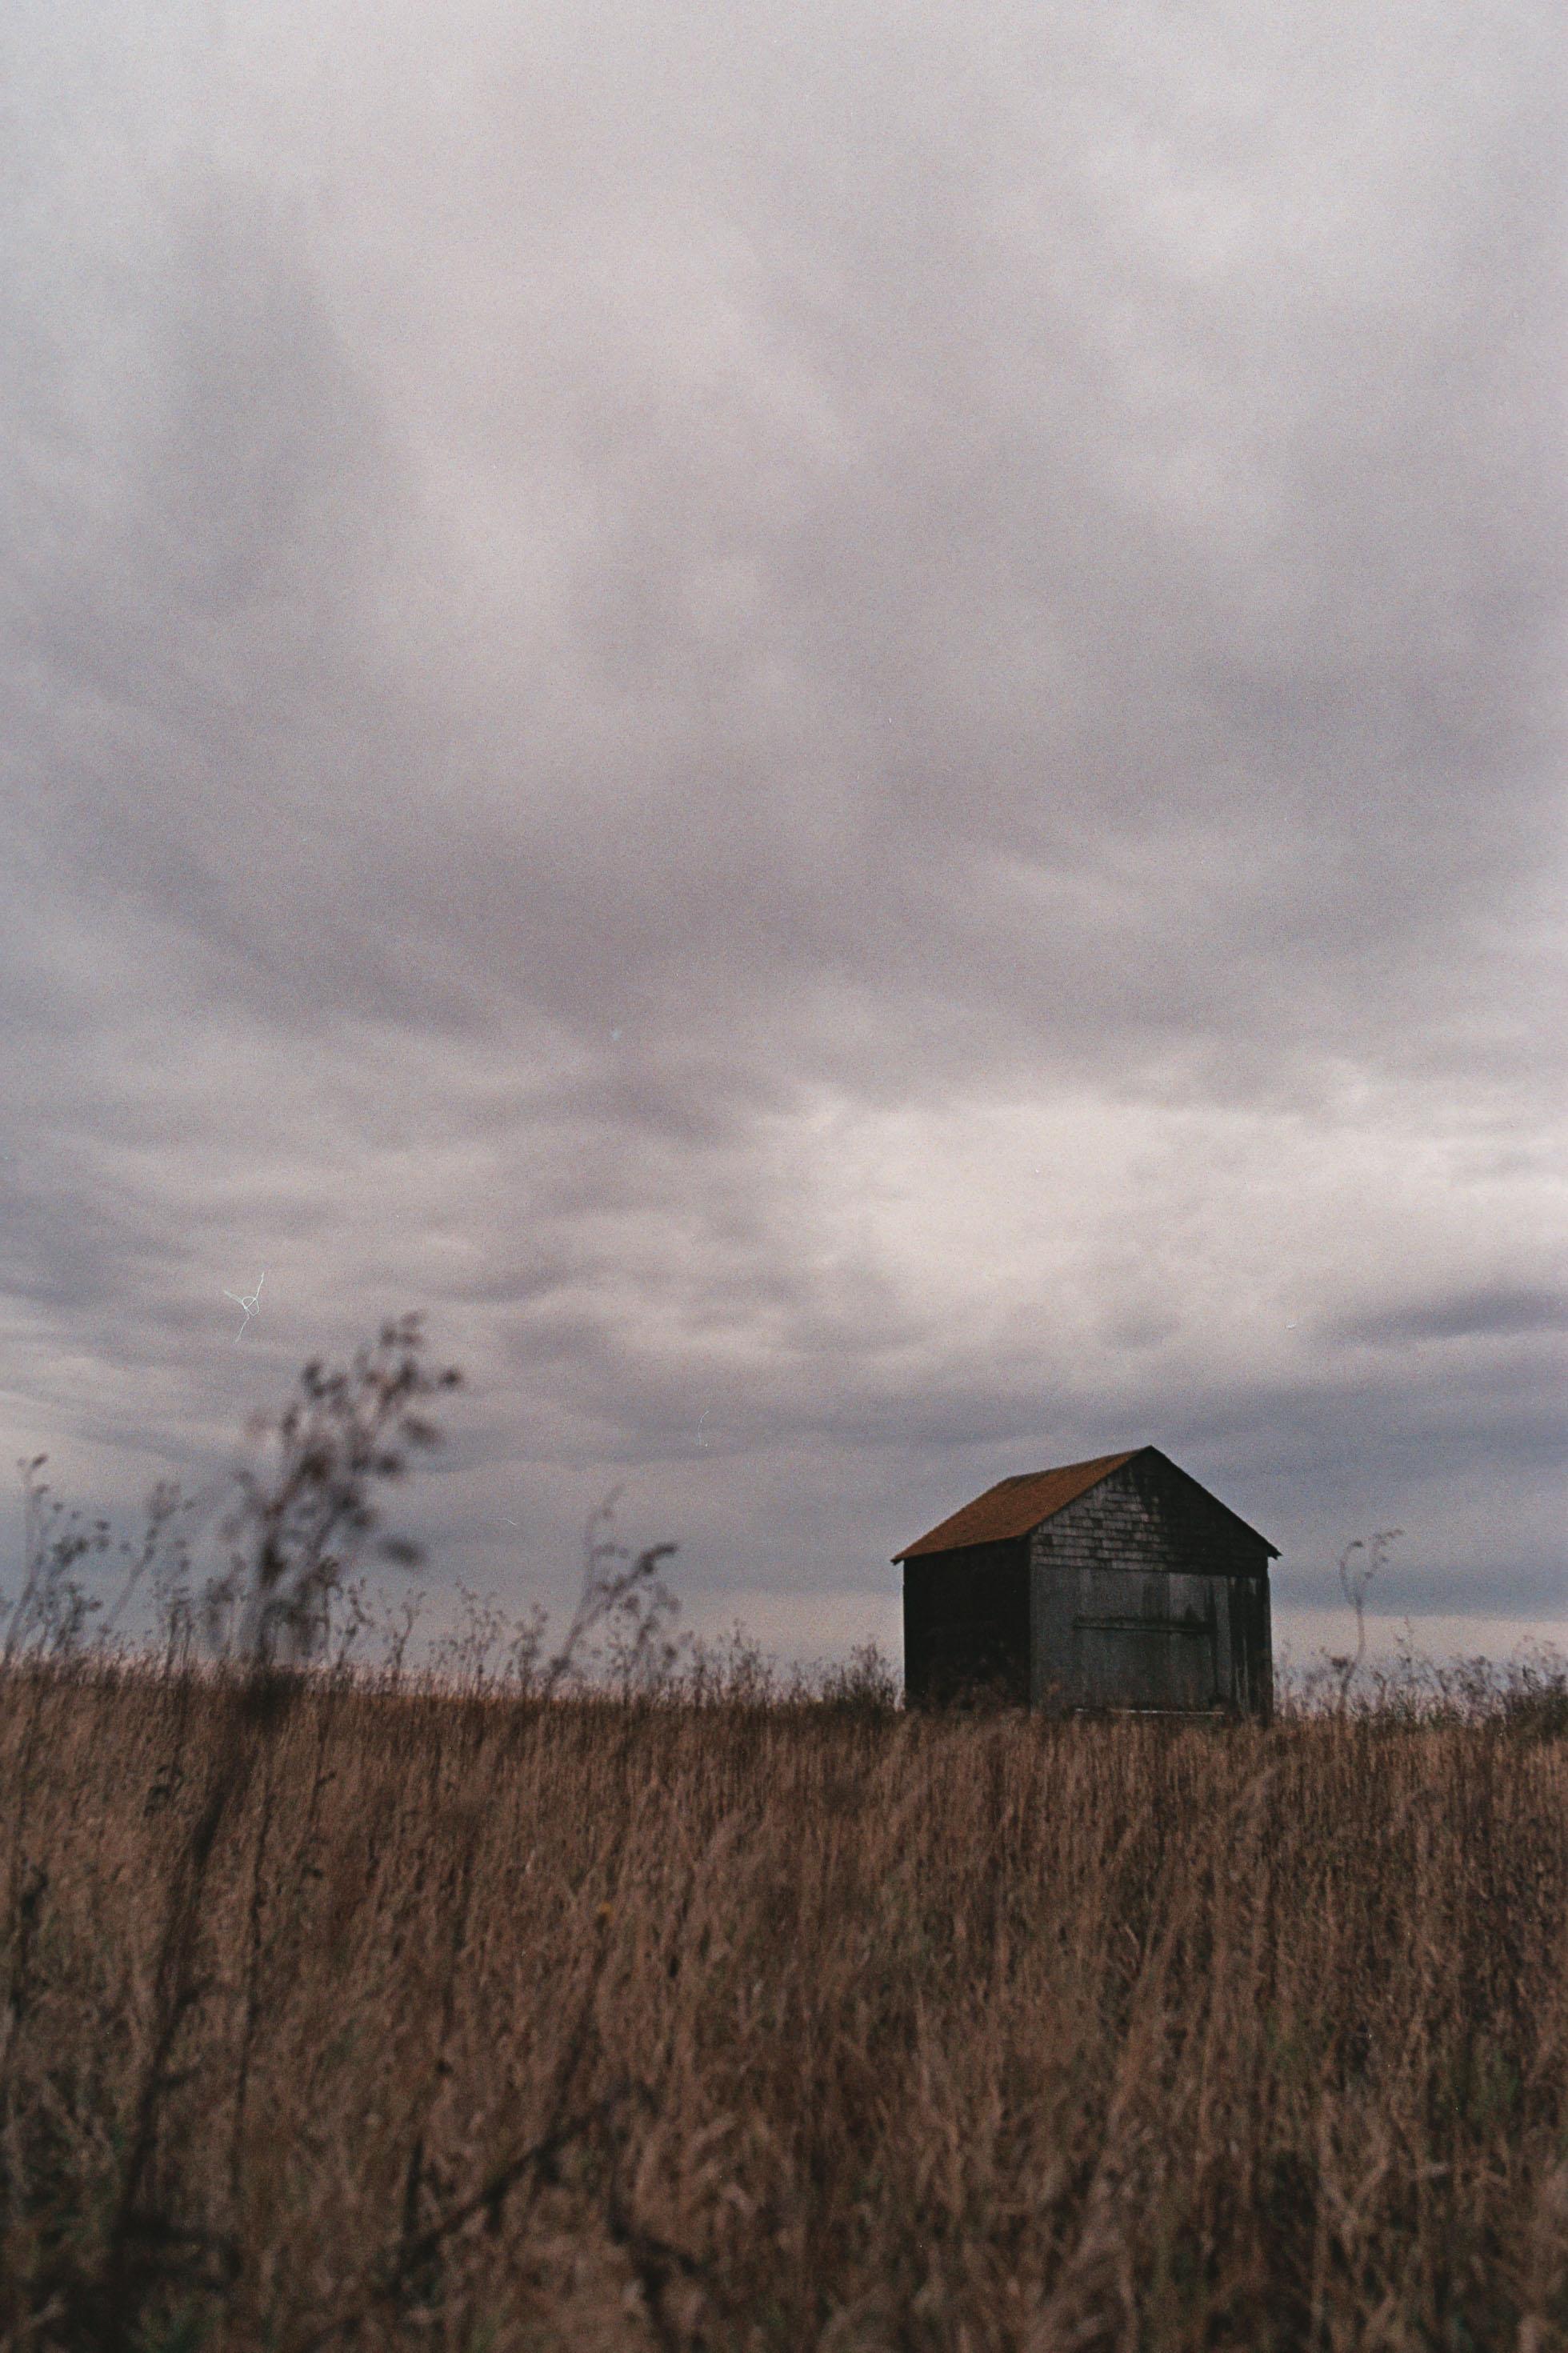 That Roof Though   Rural Saskatchewan   Canon Elan II   Sigma 35 1.4 ART   AGFA Vista Plus 200